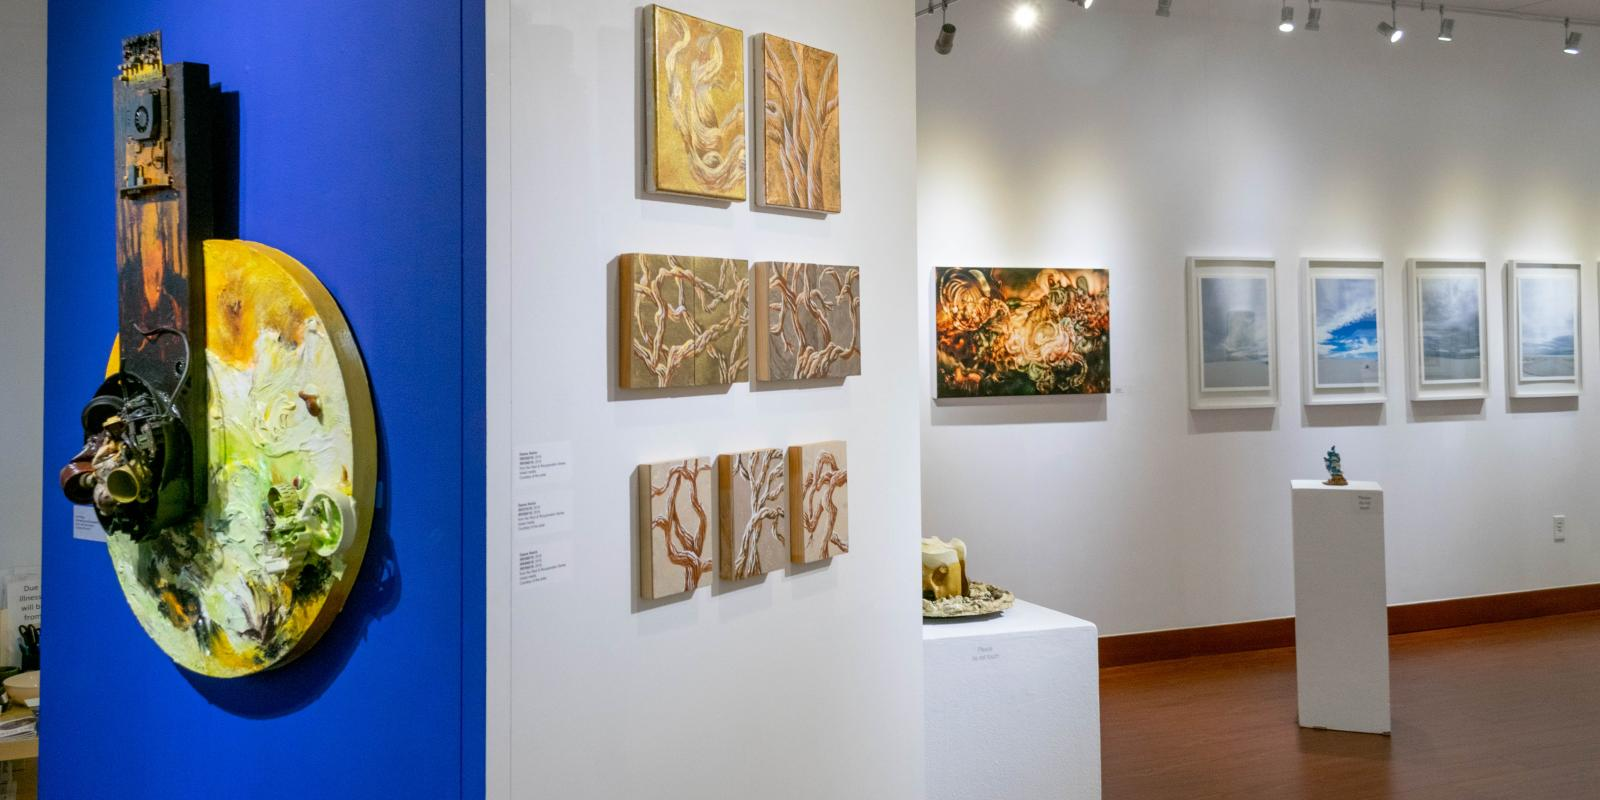 CPP Faculty Art Show - 2019 Exhibition